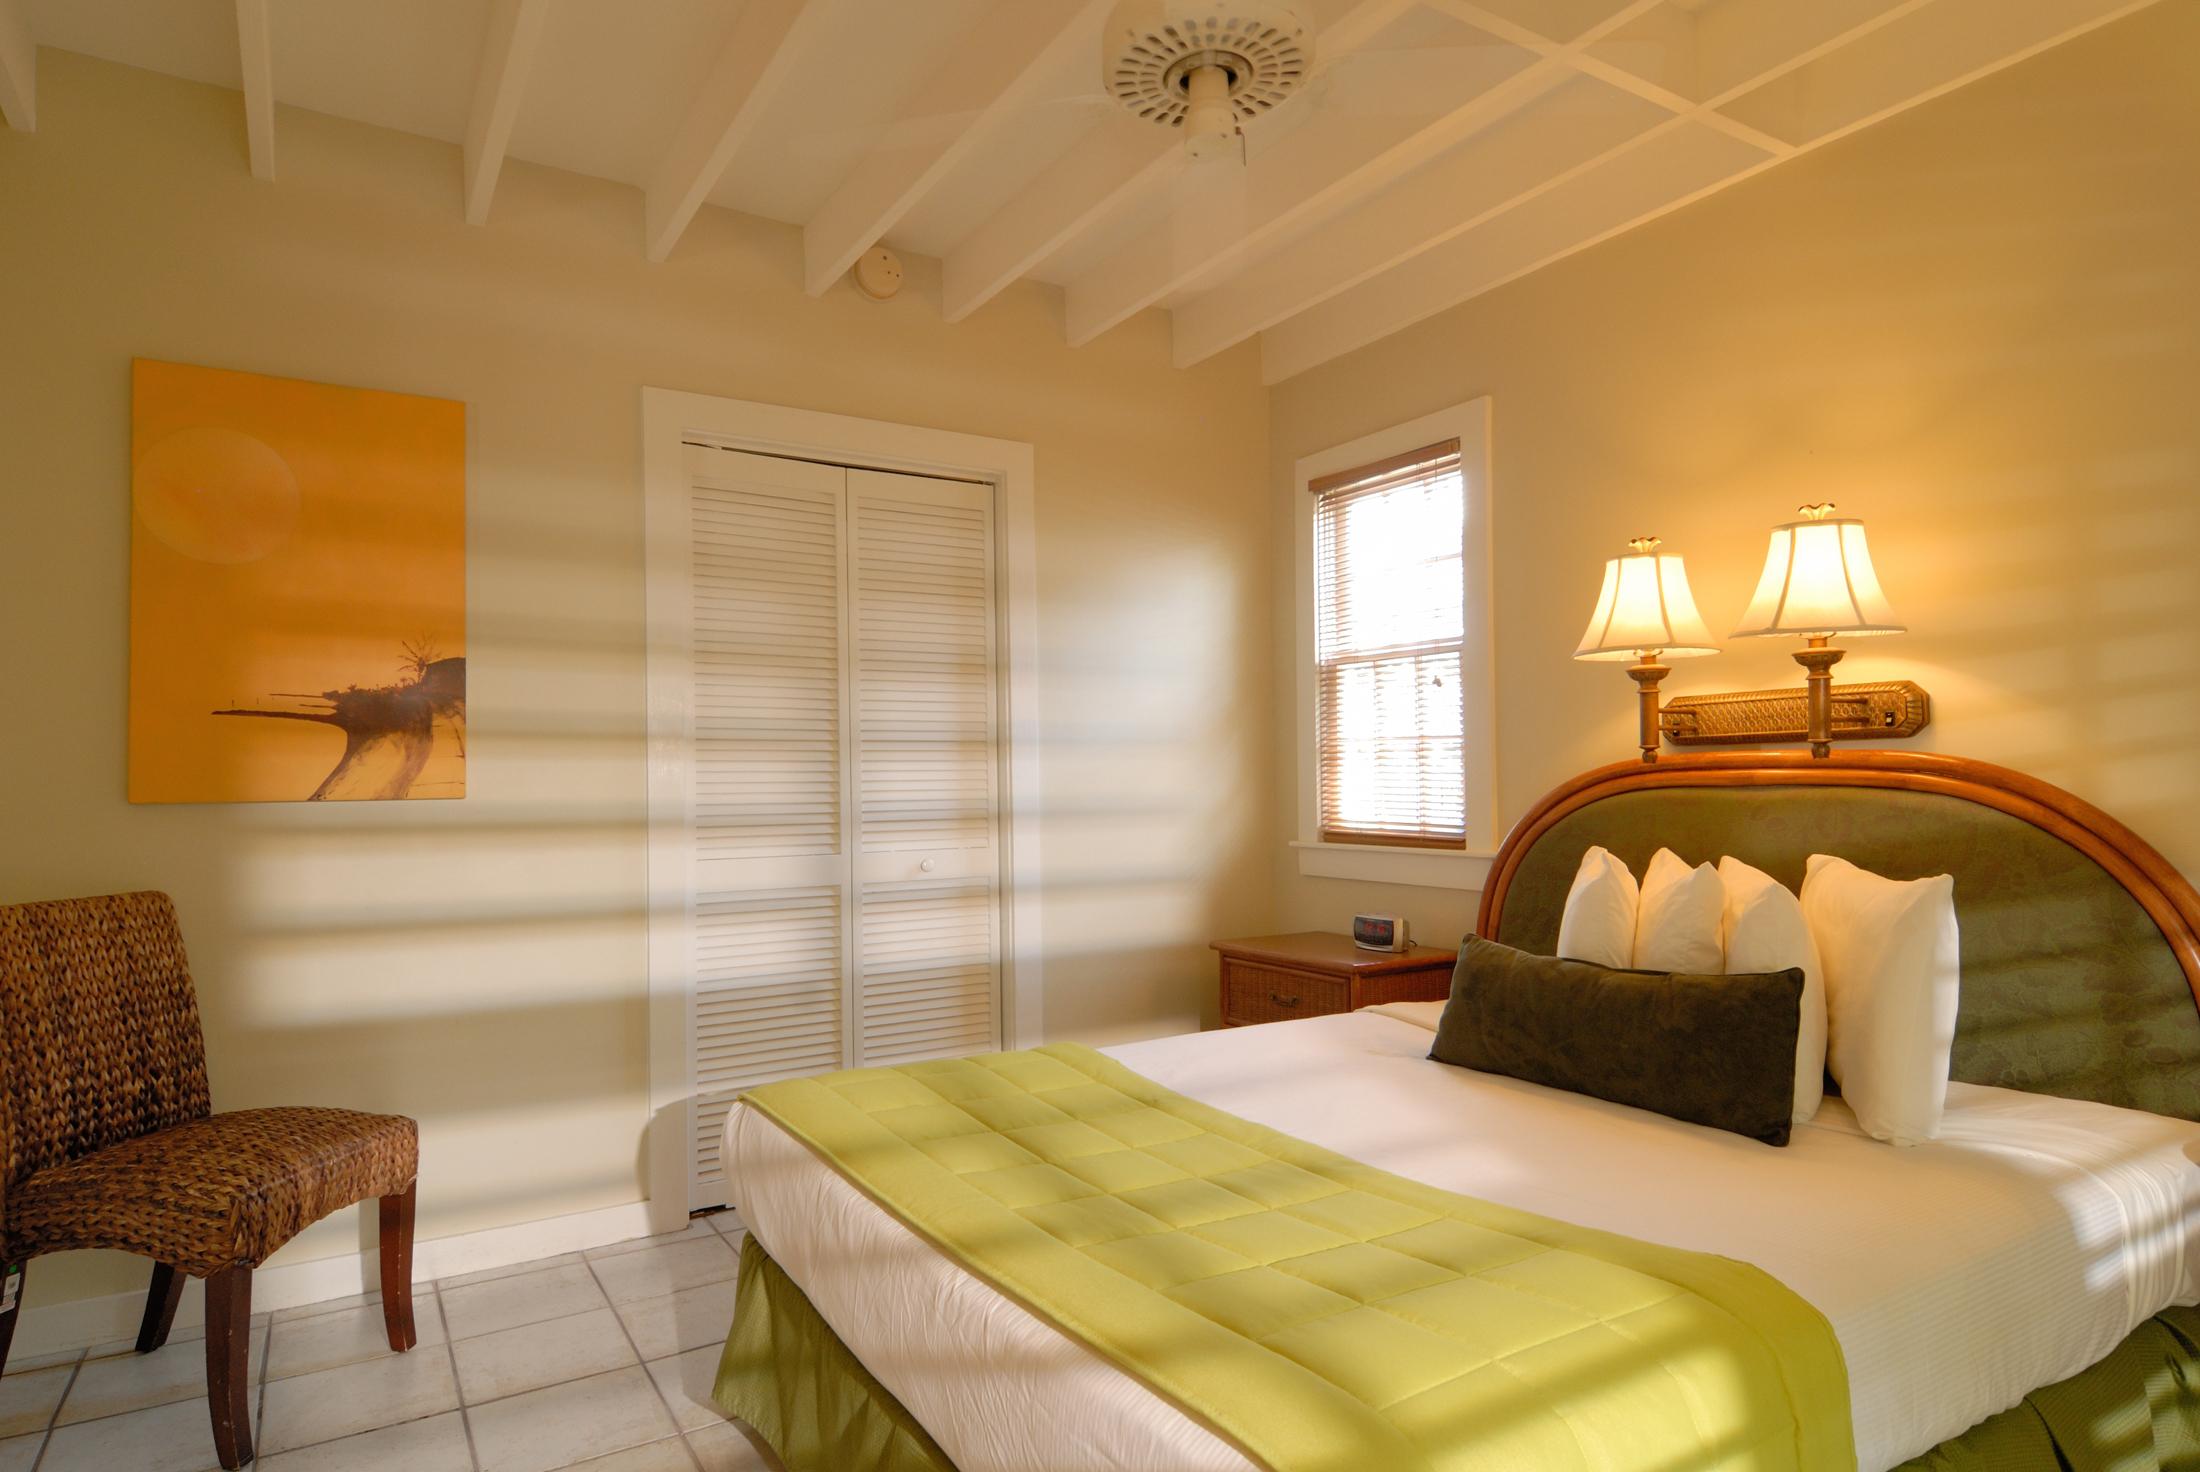 Merlin Guest House in Key West image 5